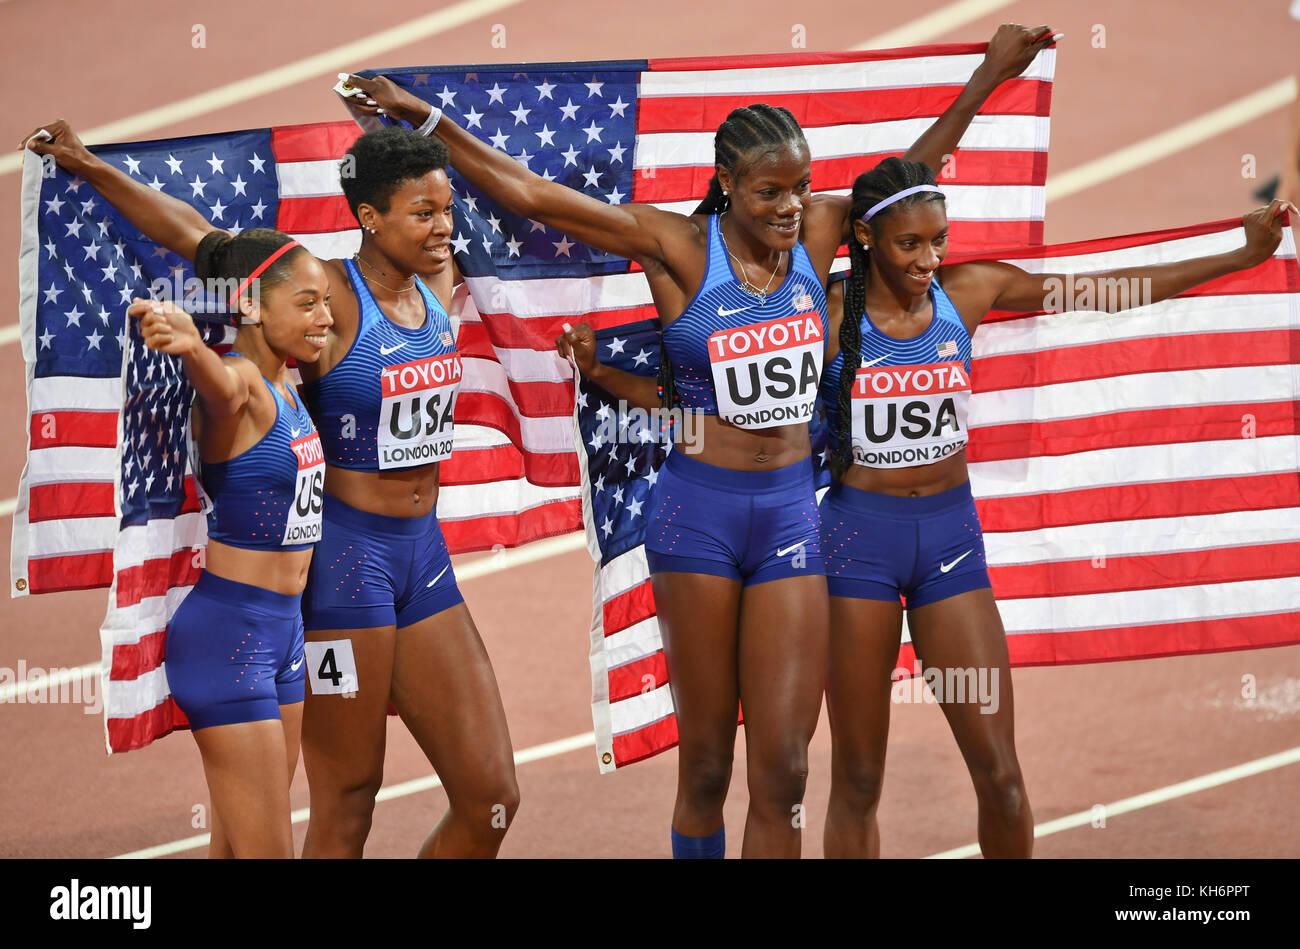 USA Team - 4x400 relays Gold Medal - IAAF World Championships - London 2017 Stock Photo